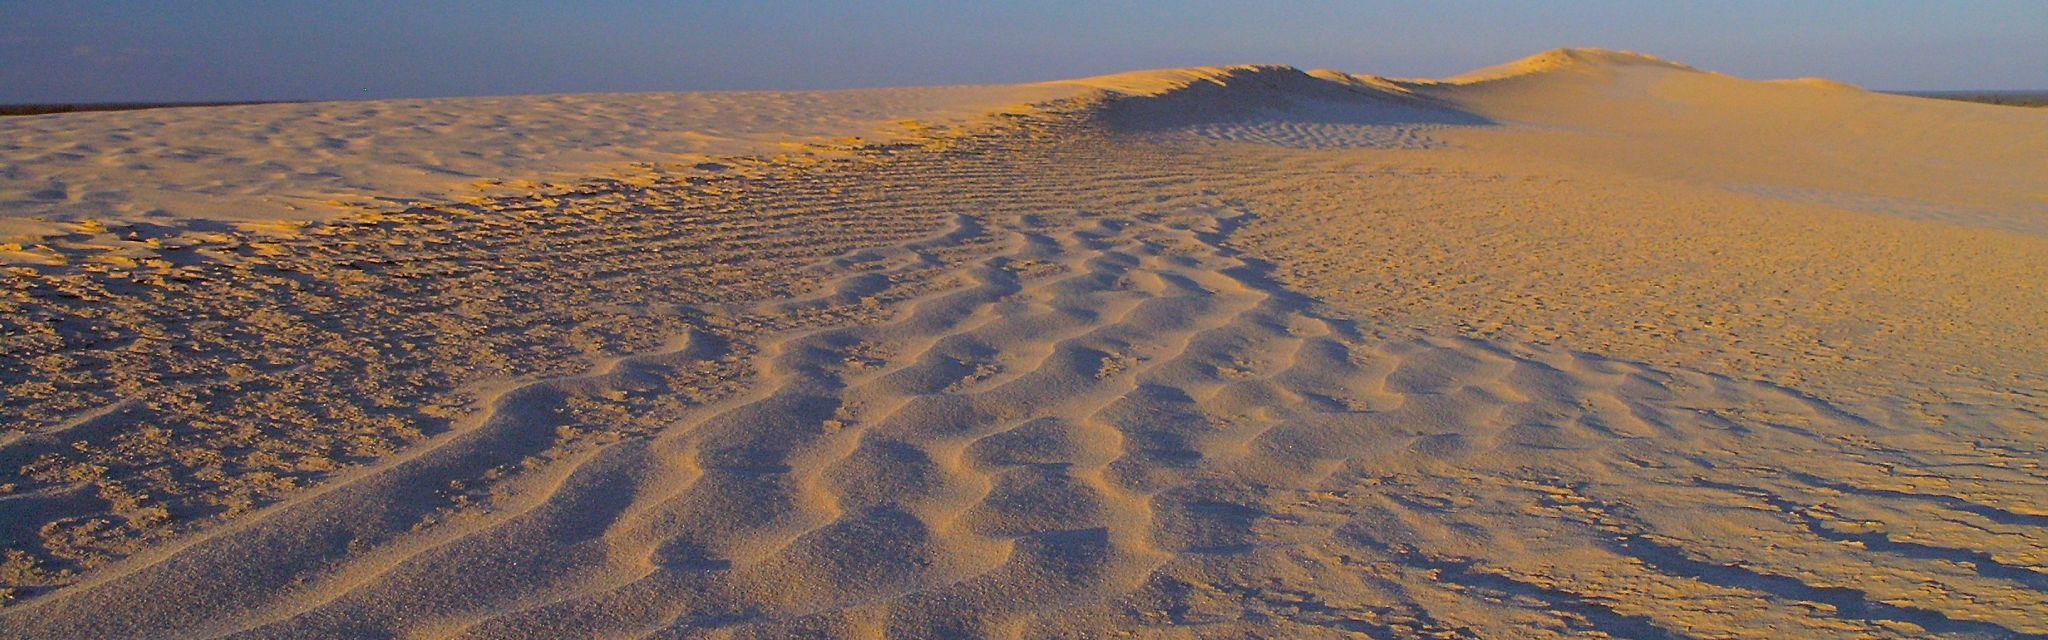 Rippled Dune Mungo National Park, image from a Nature Bound Australia tour